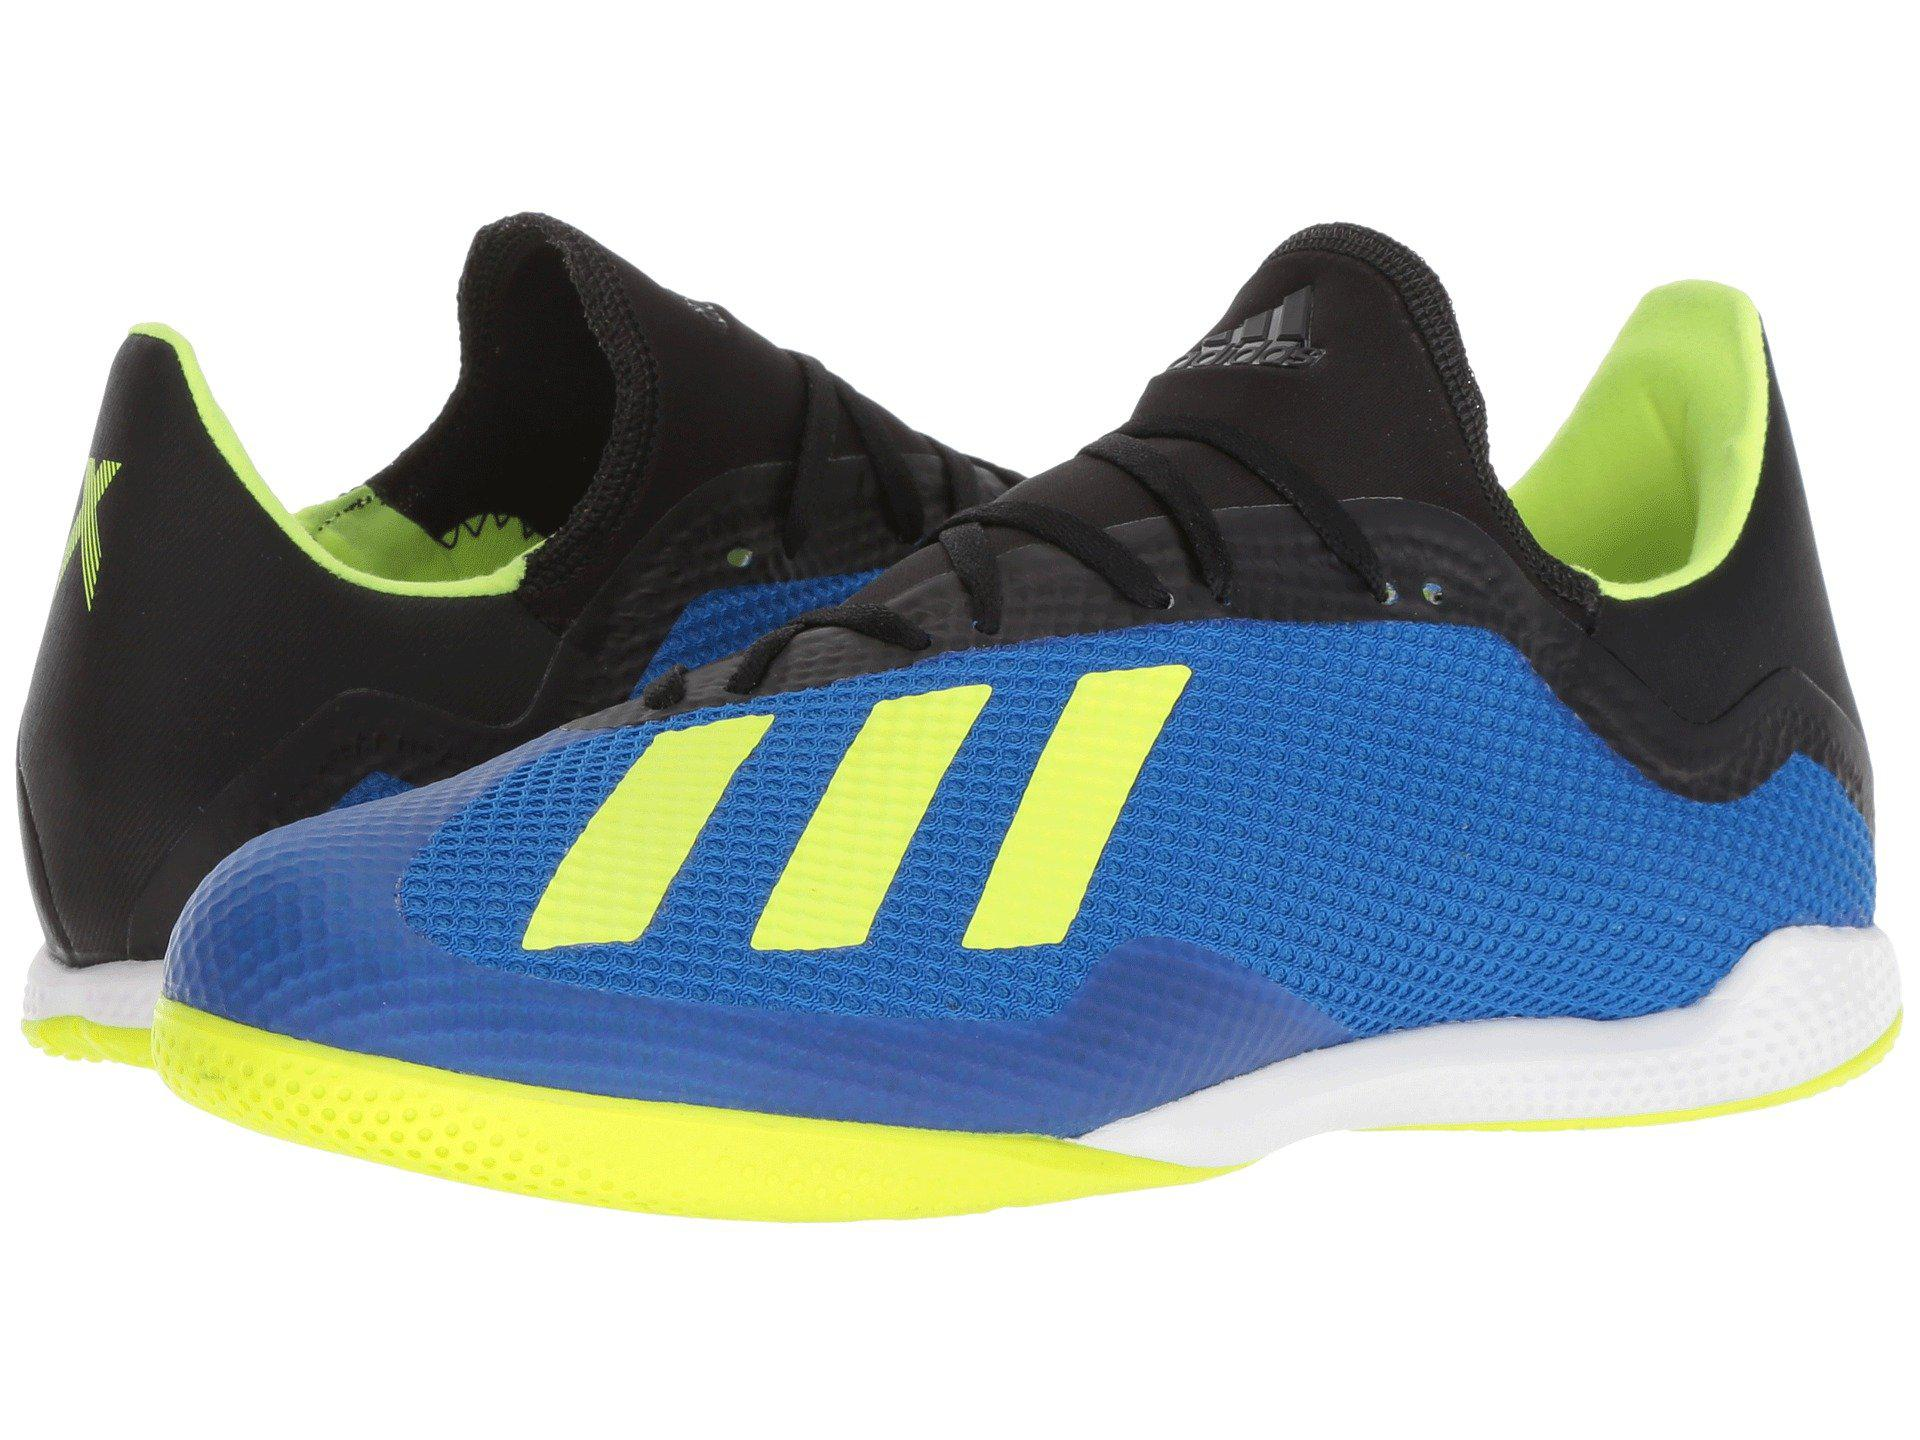 911f28138109 uk store 156b4 8b5f9 adidas mens x tango 18.4 turf soccer shoe ...